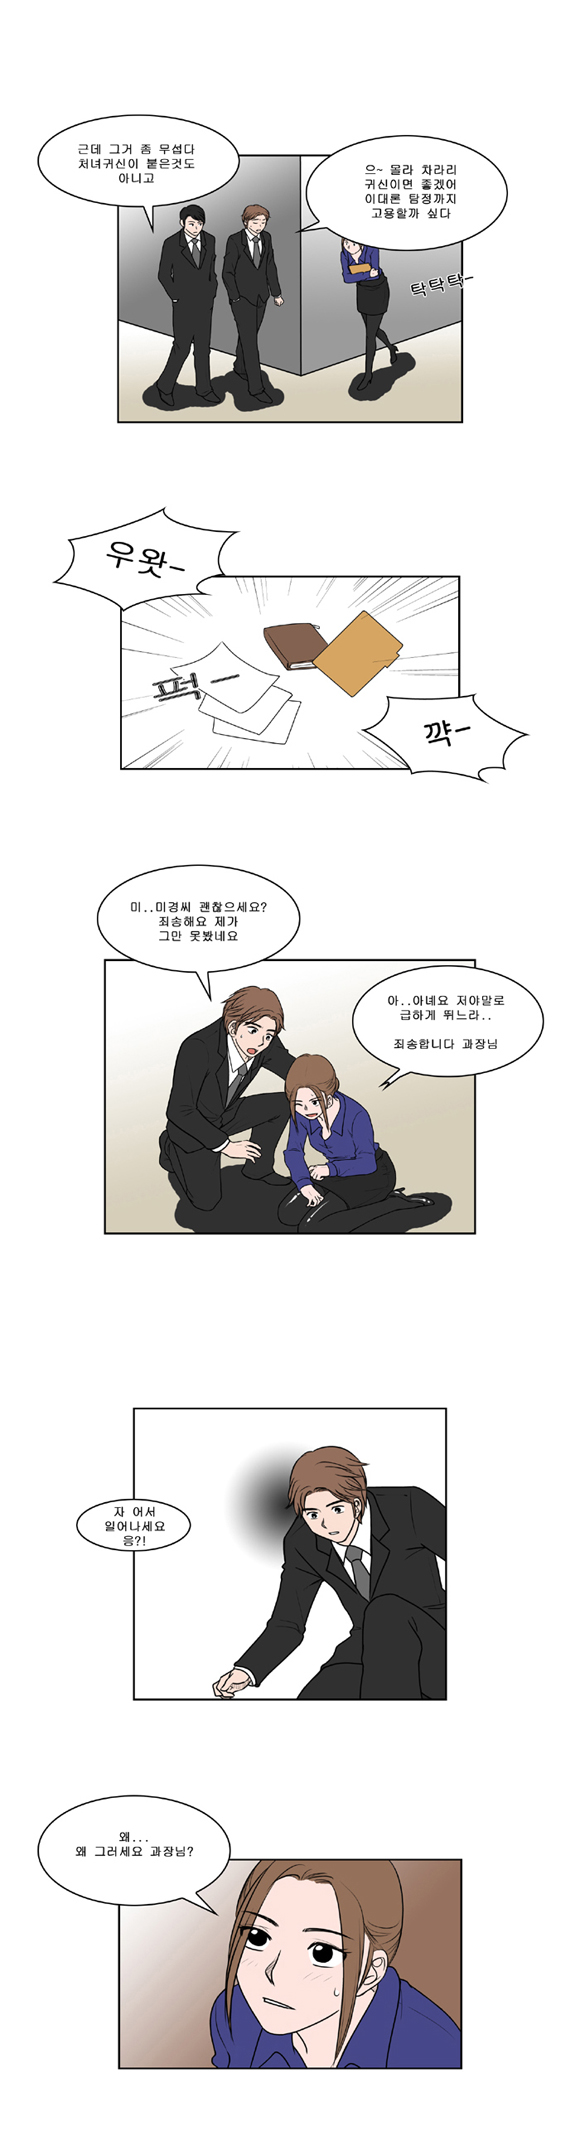 duocartoon_11_04.jpg